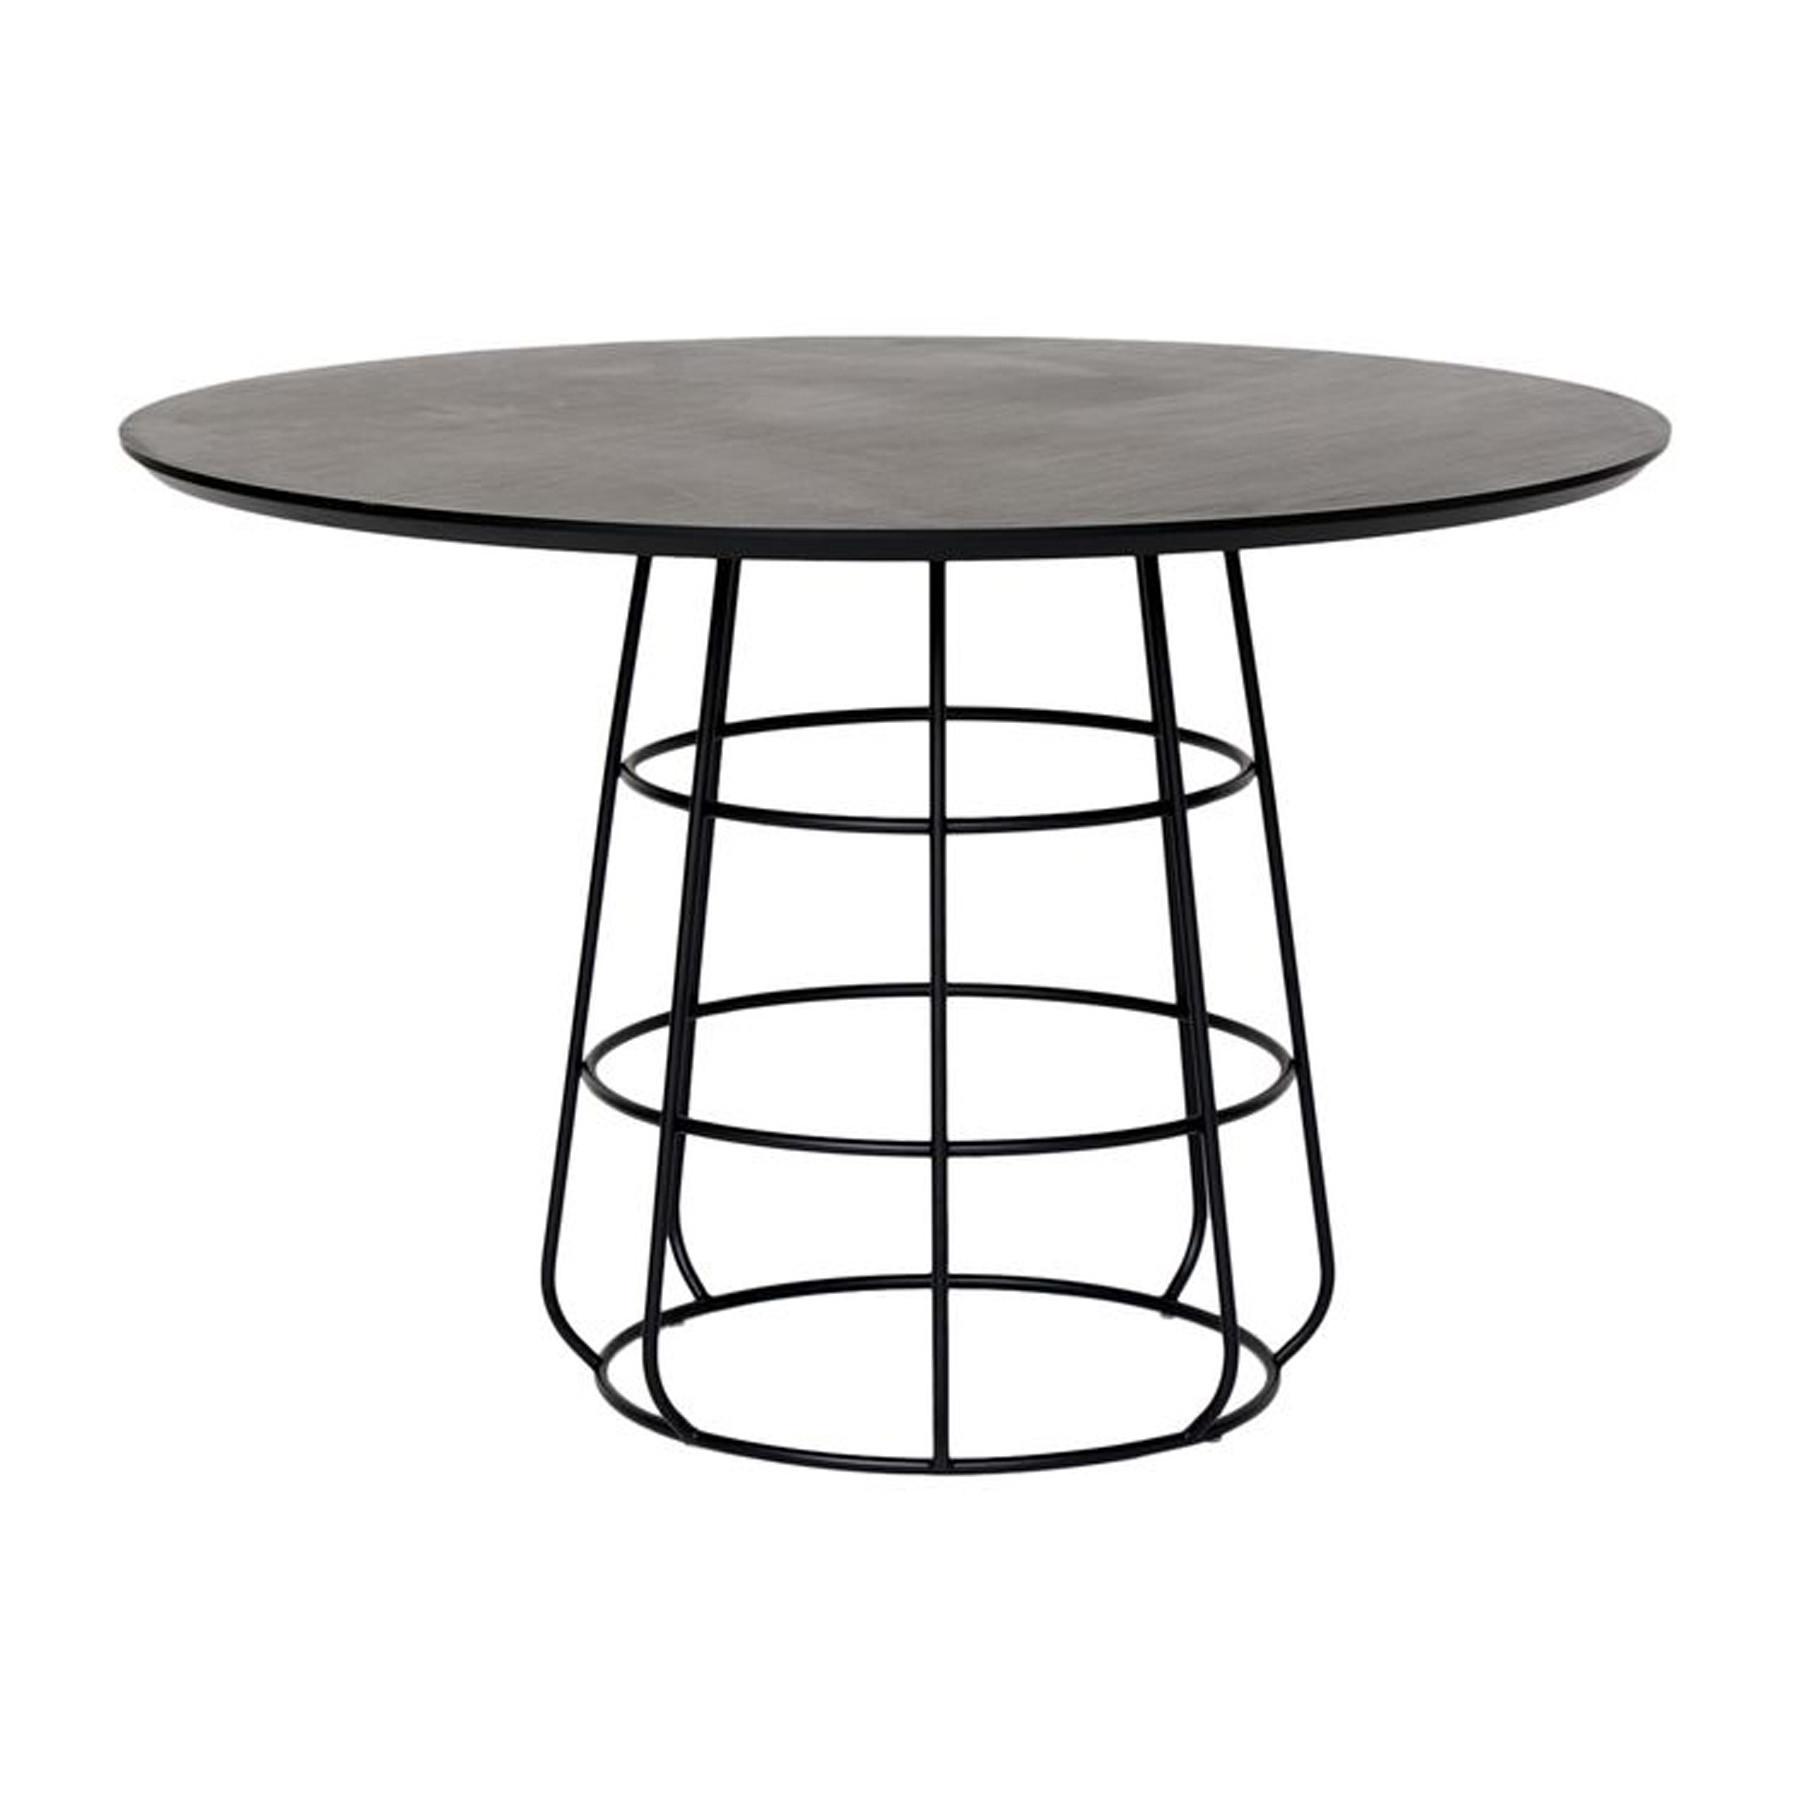 mesa de jantar redonda estilo industrial em aço carbono